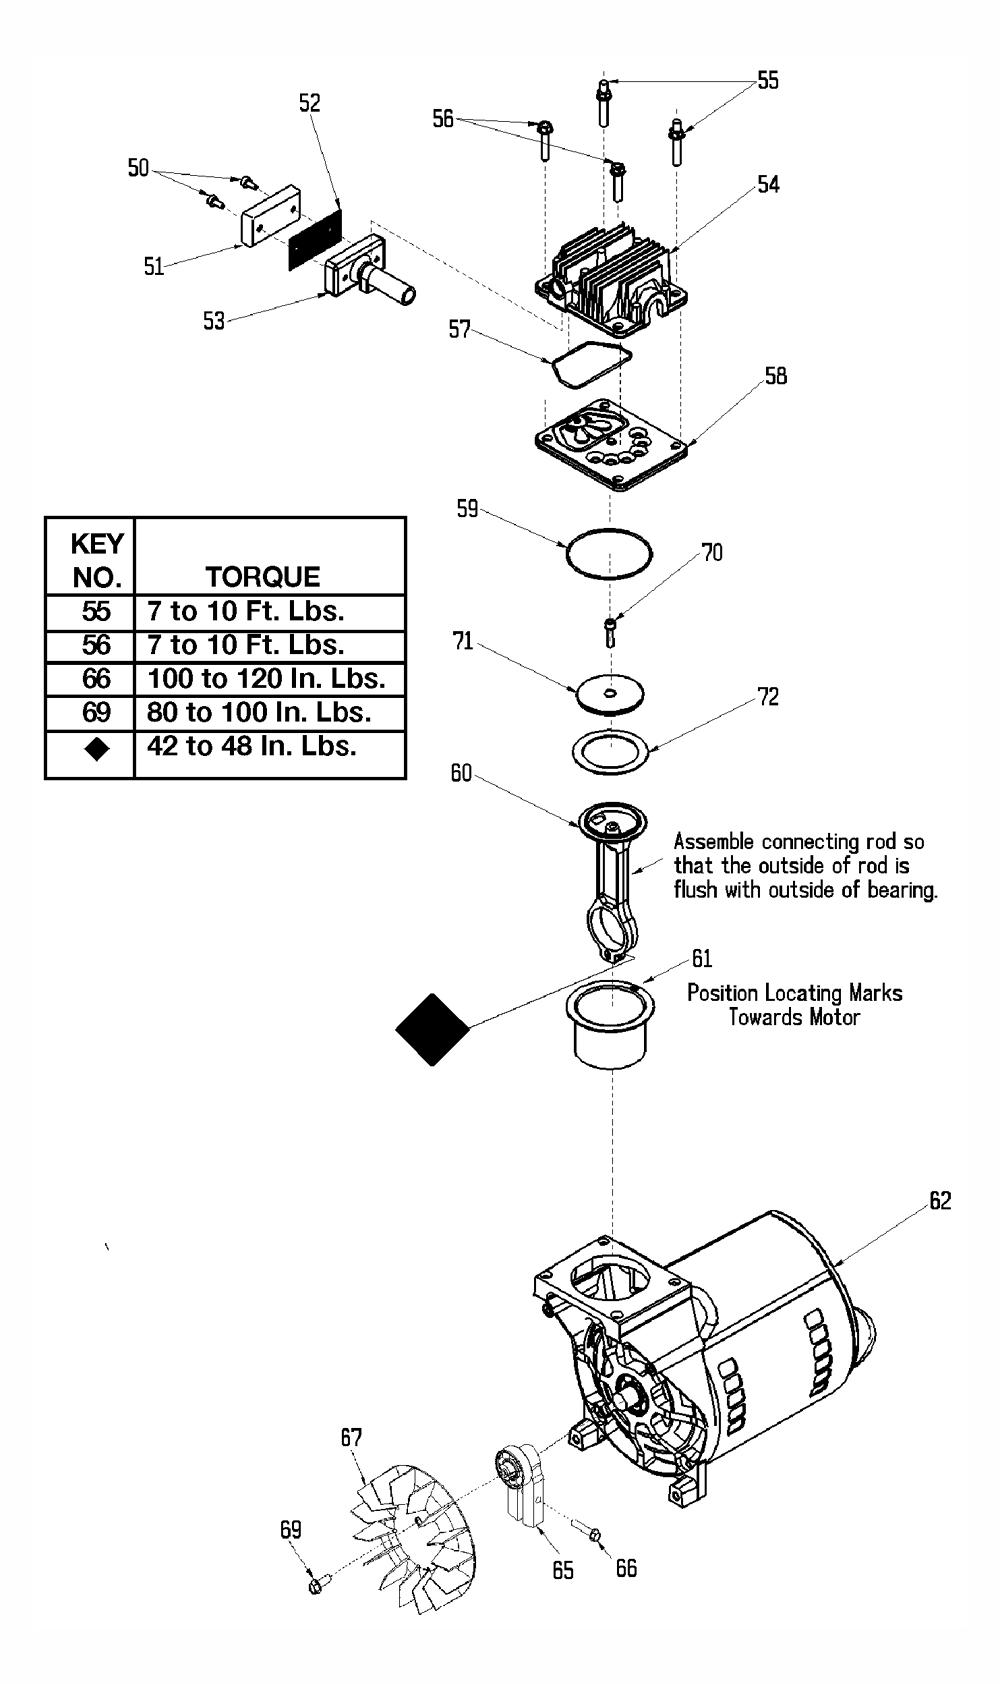 GFC5020-Porter-Cable-T0-PB-1Break Down